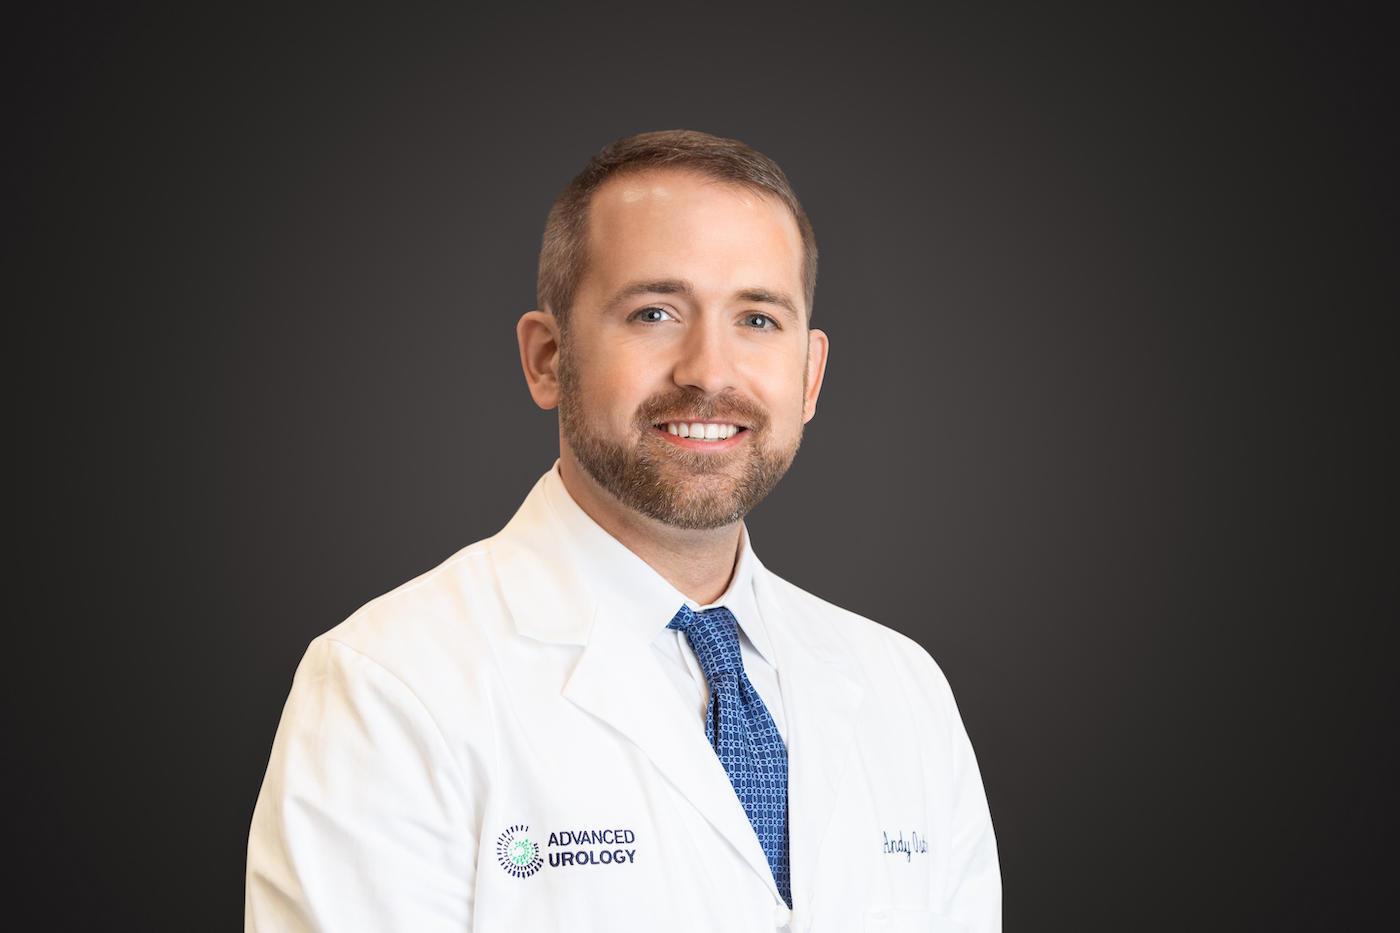 Andy Ostrowski MD